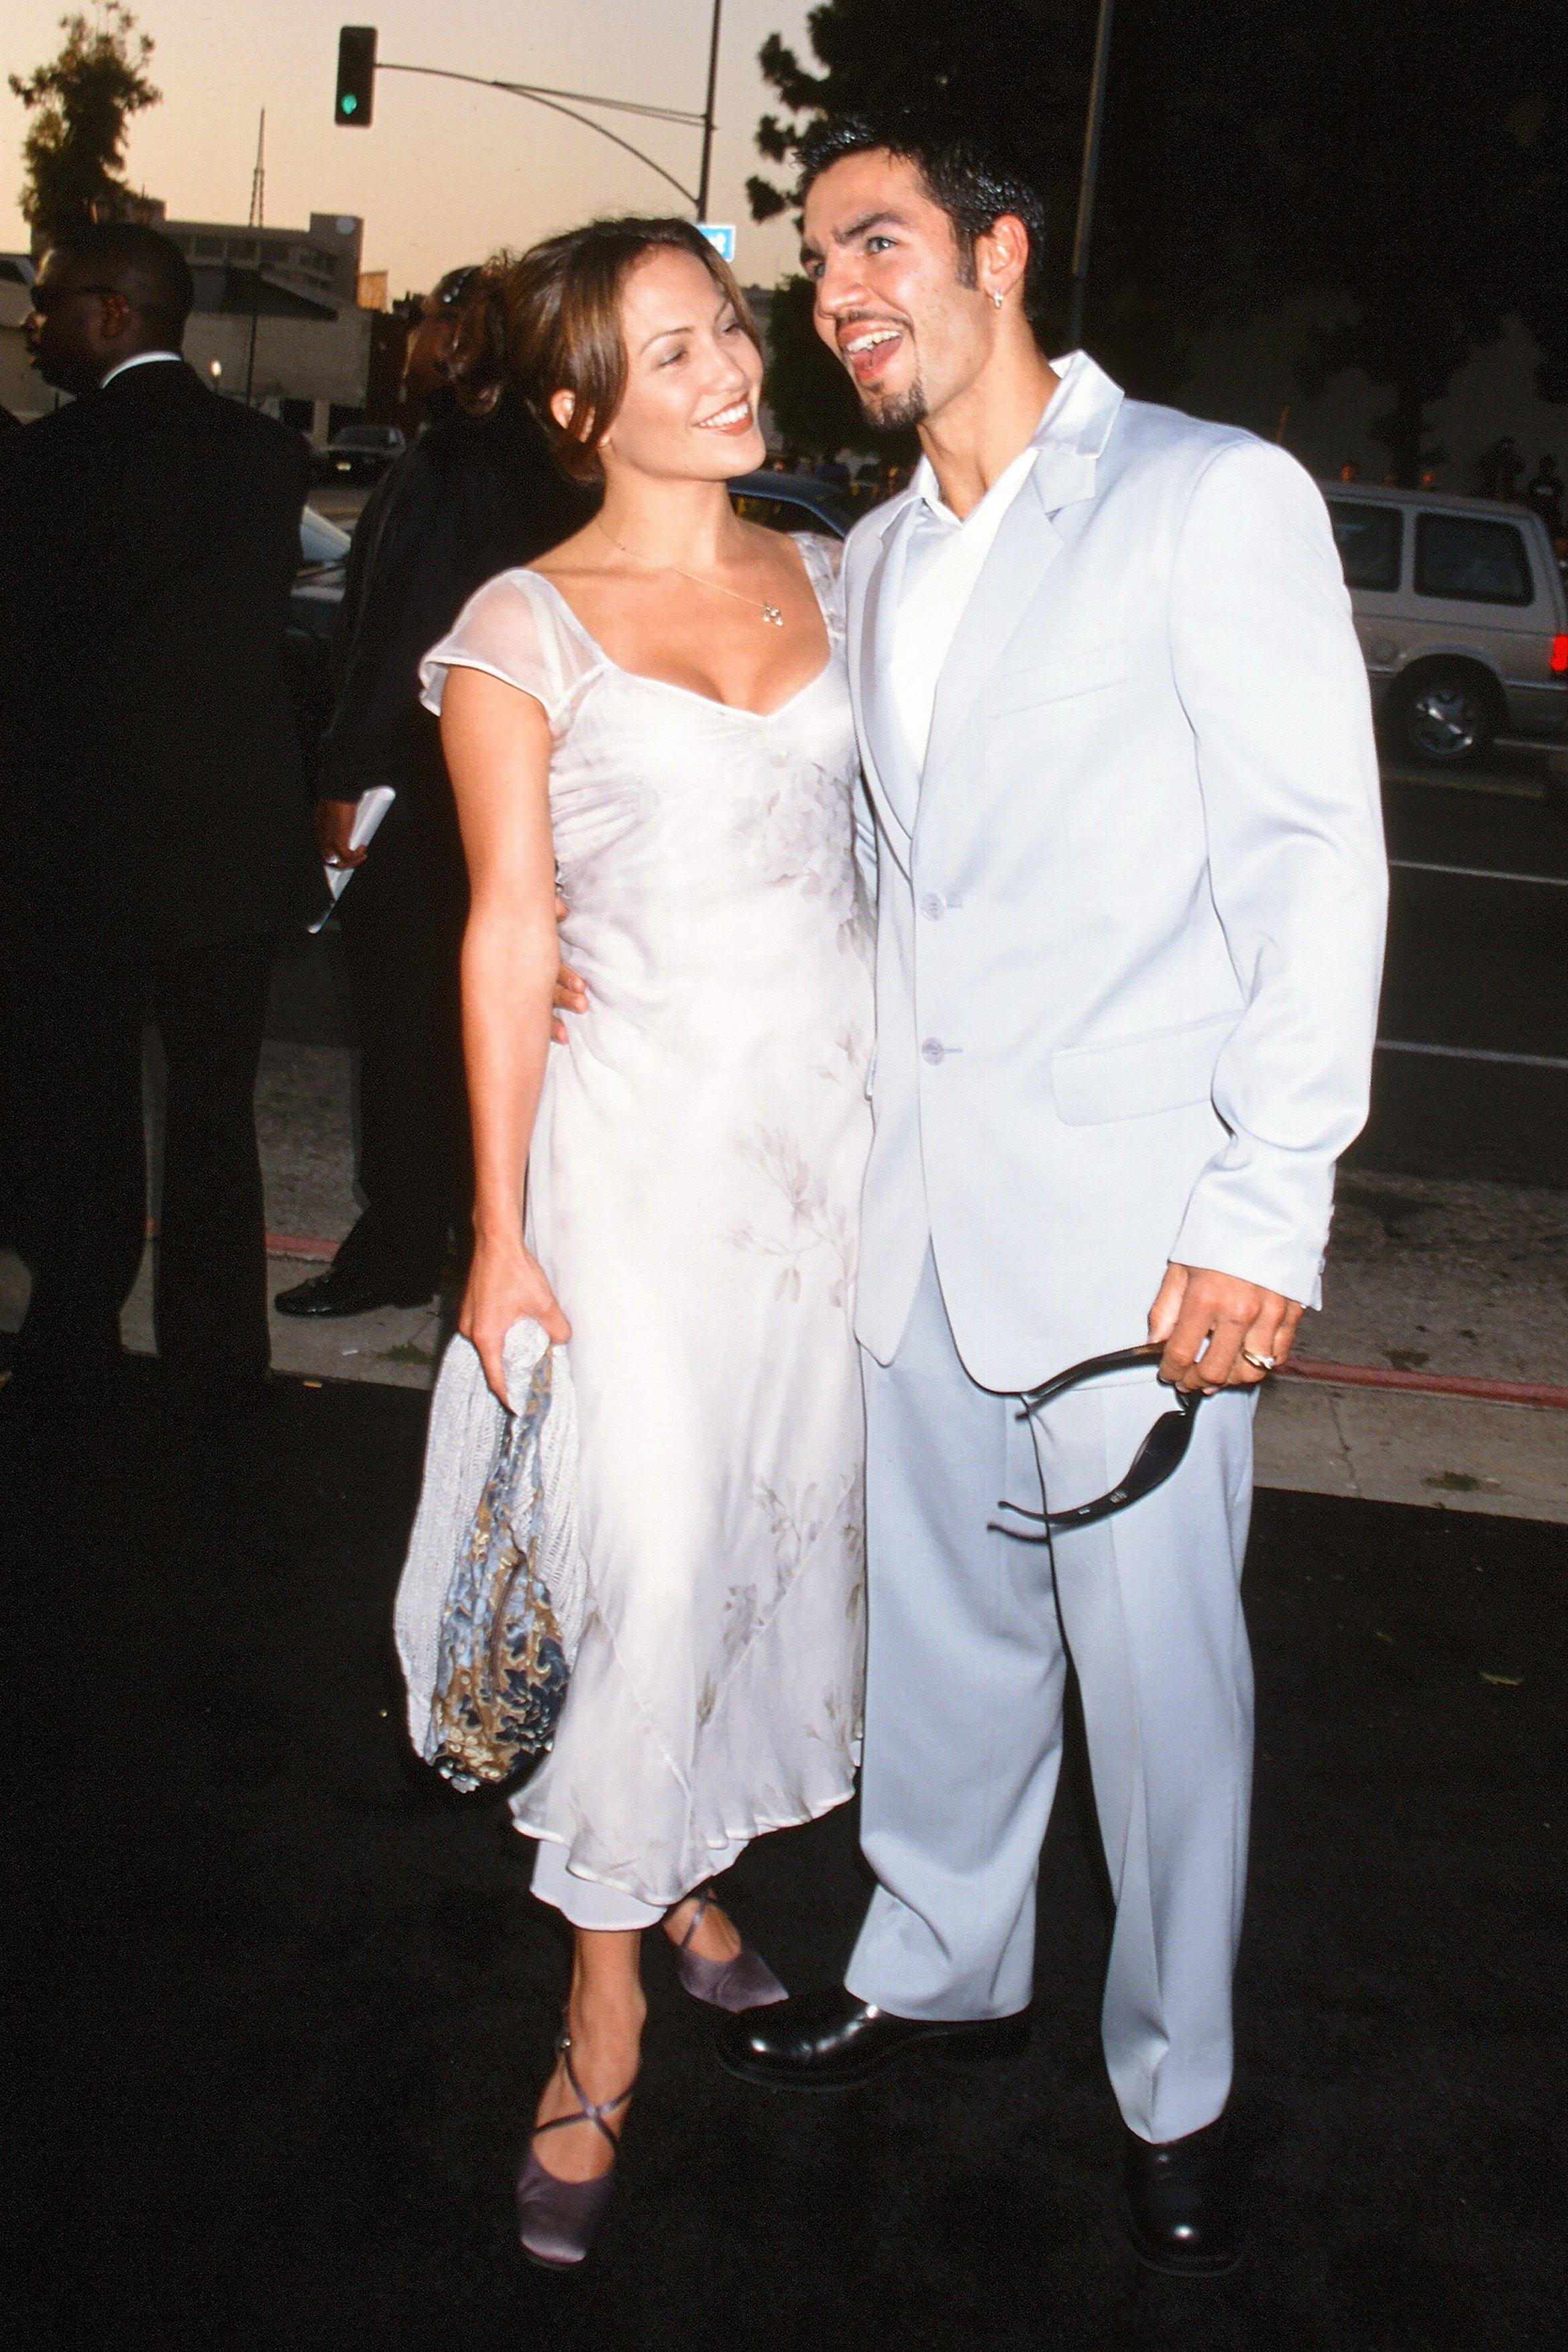 June 25, 1997 - Los Angeles, CA, USA - LOS ANGELES - JUN 25:  Ojani Noa, Jennifer Lopez at the ''Men in Black'' Premiere at the Cinerama Dome on June 25, 1997 in Los Angeles, CA, Image: 332288618, License: Rights-managed, Restrictions: , Model Release: no, Credit line: Profimedia, Zuma Press - Archives